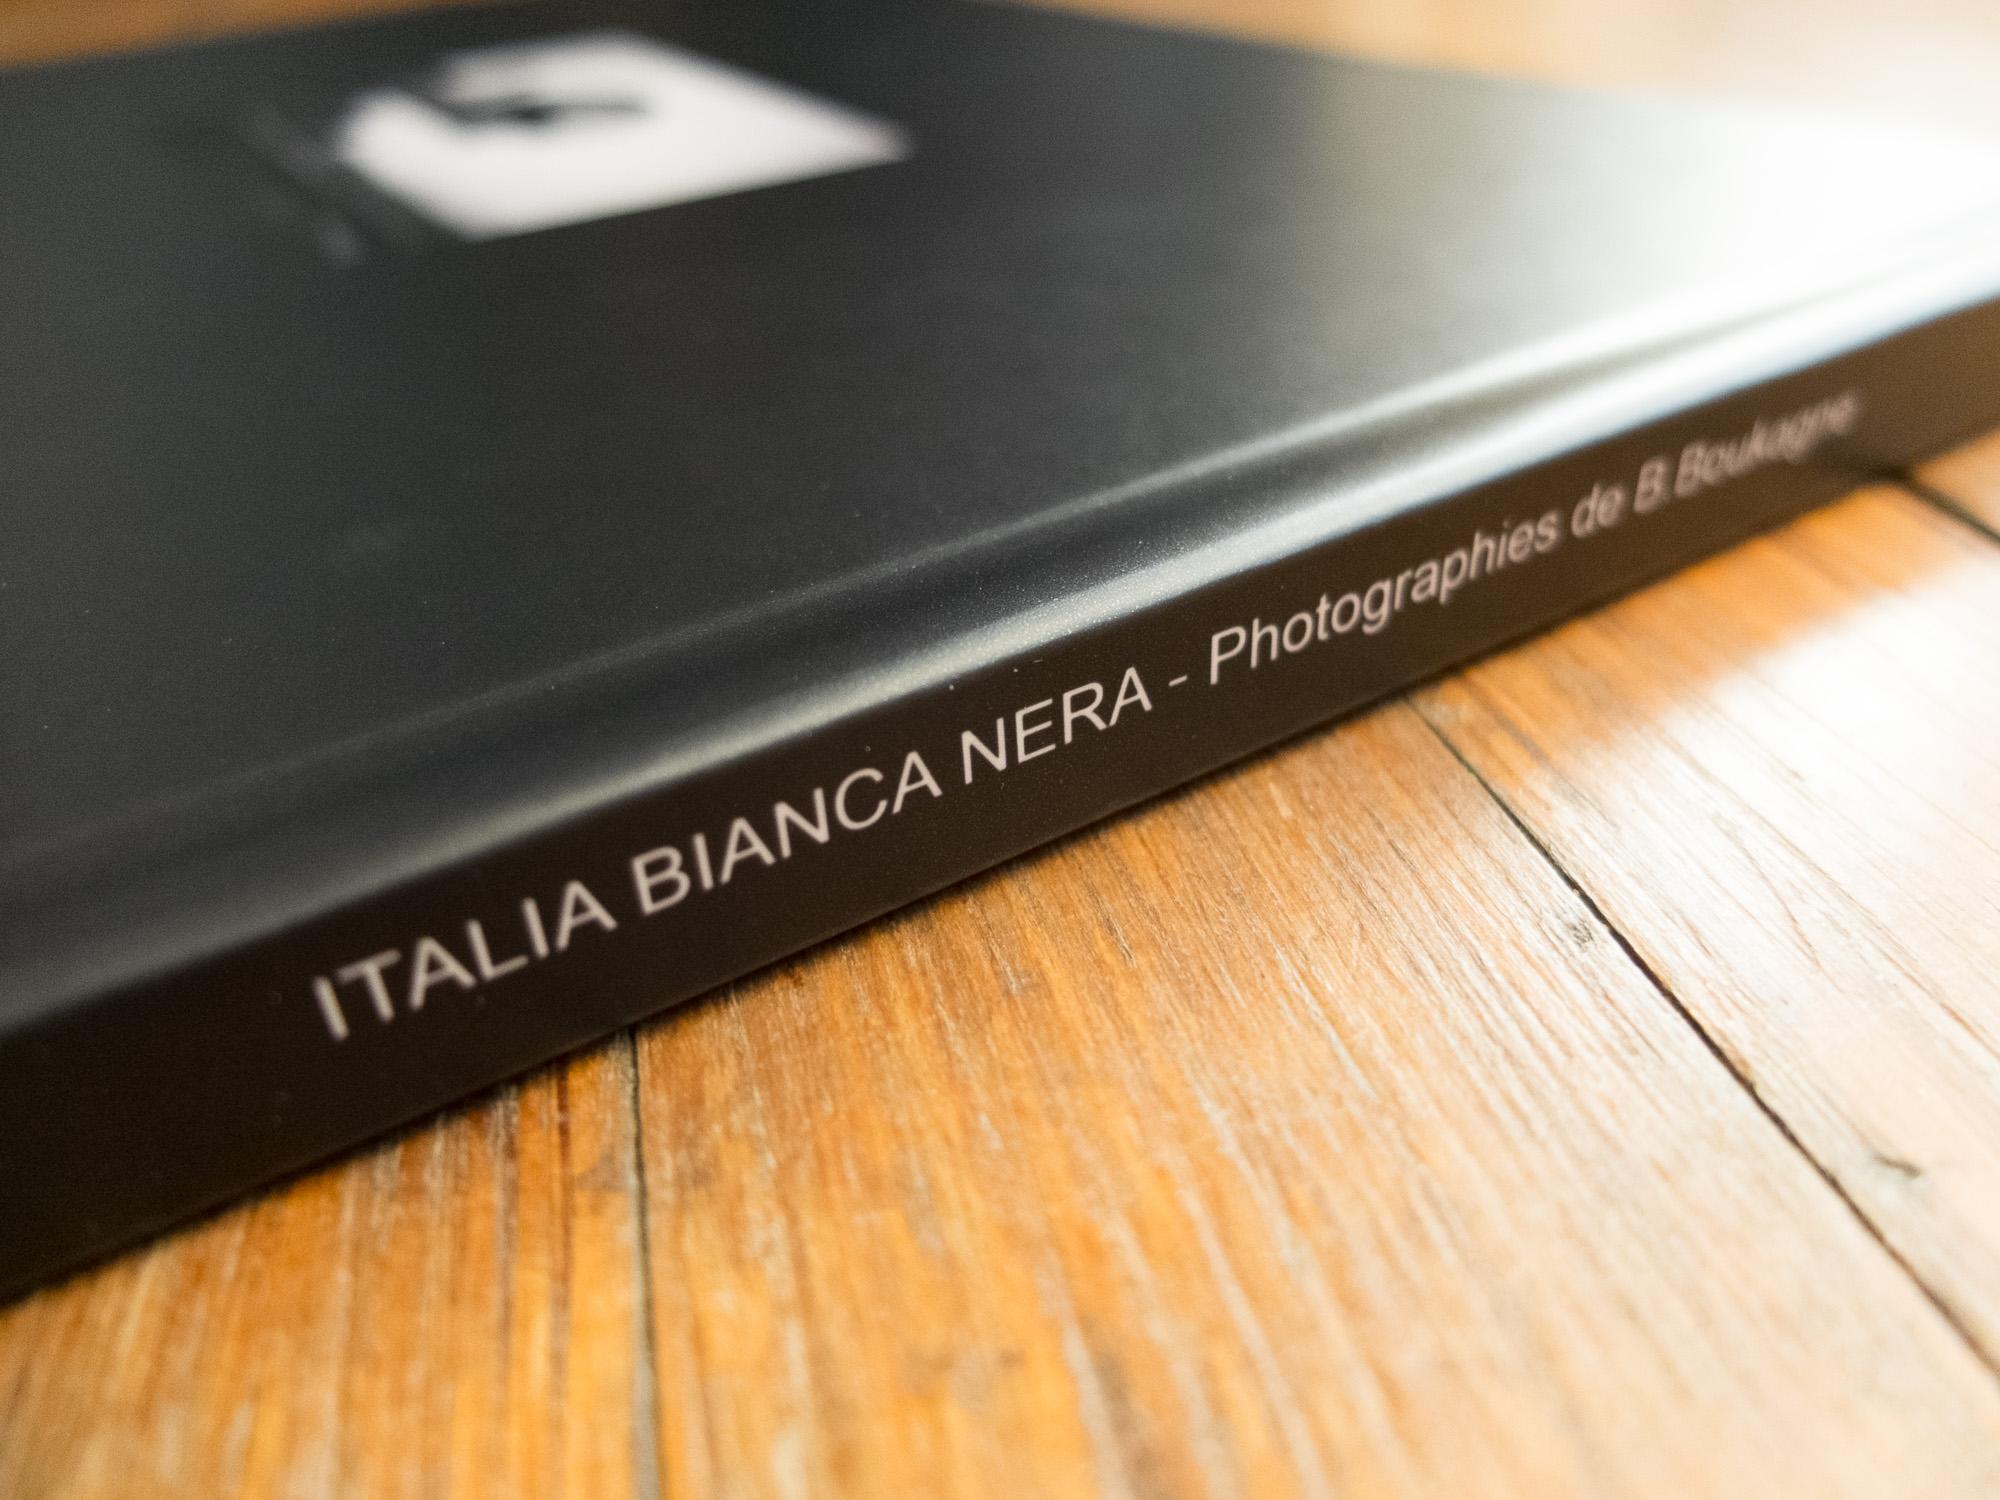 Italia-Bianca-Nera-BOOK-15.jpg